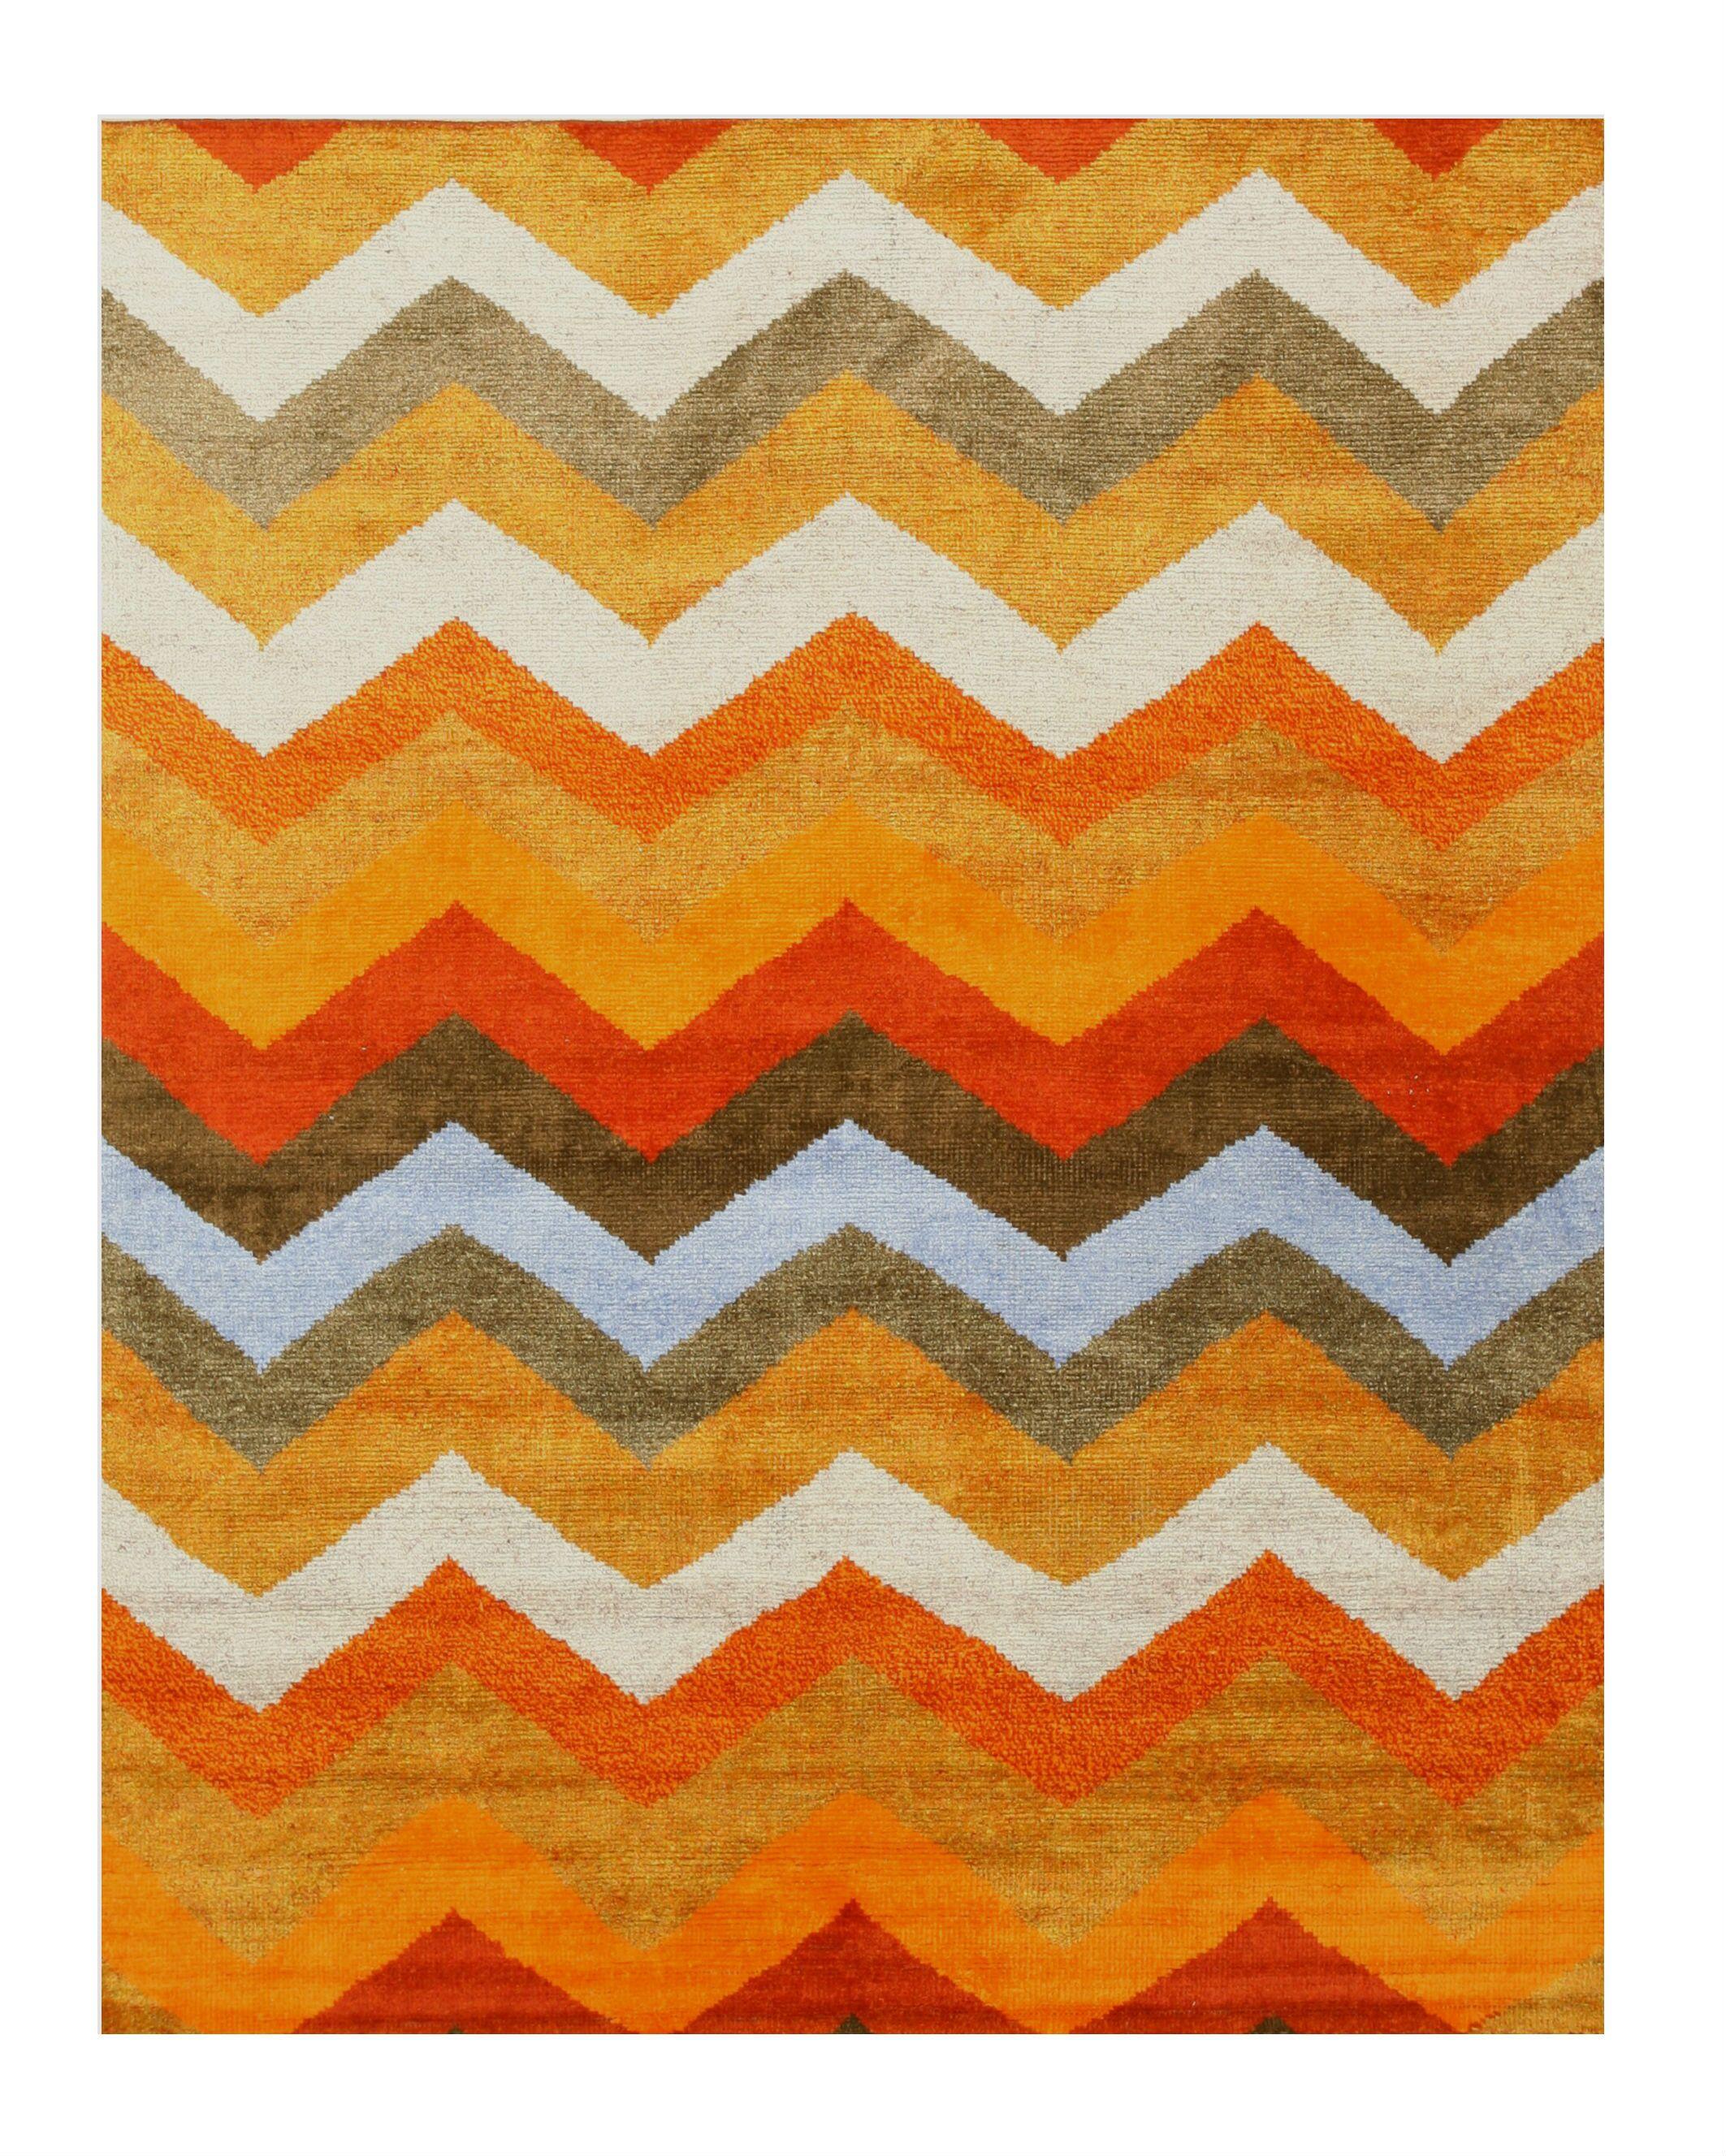 Chevron Hand-Knotted Orange Area Rug Rug Size: 8' x 10'